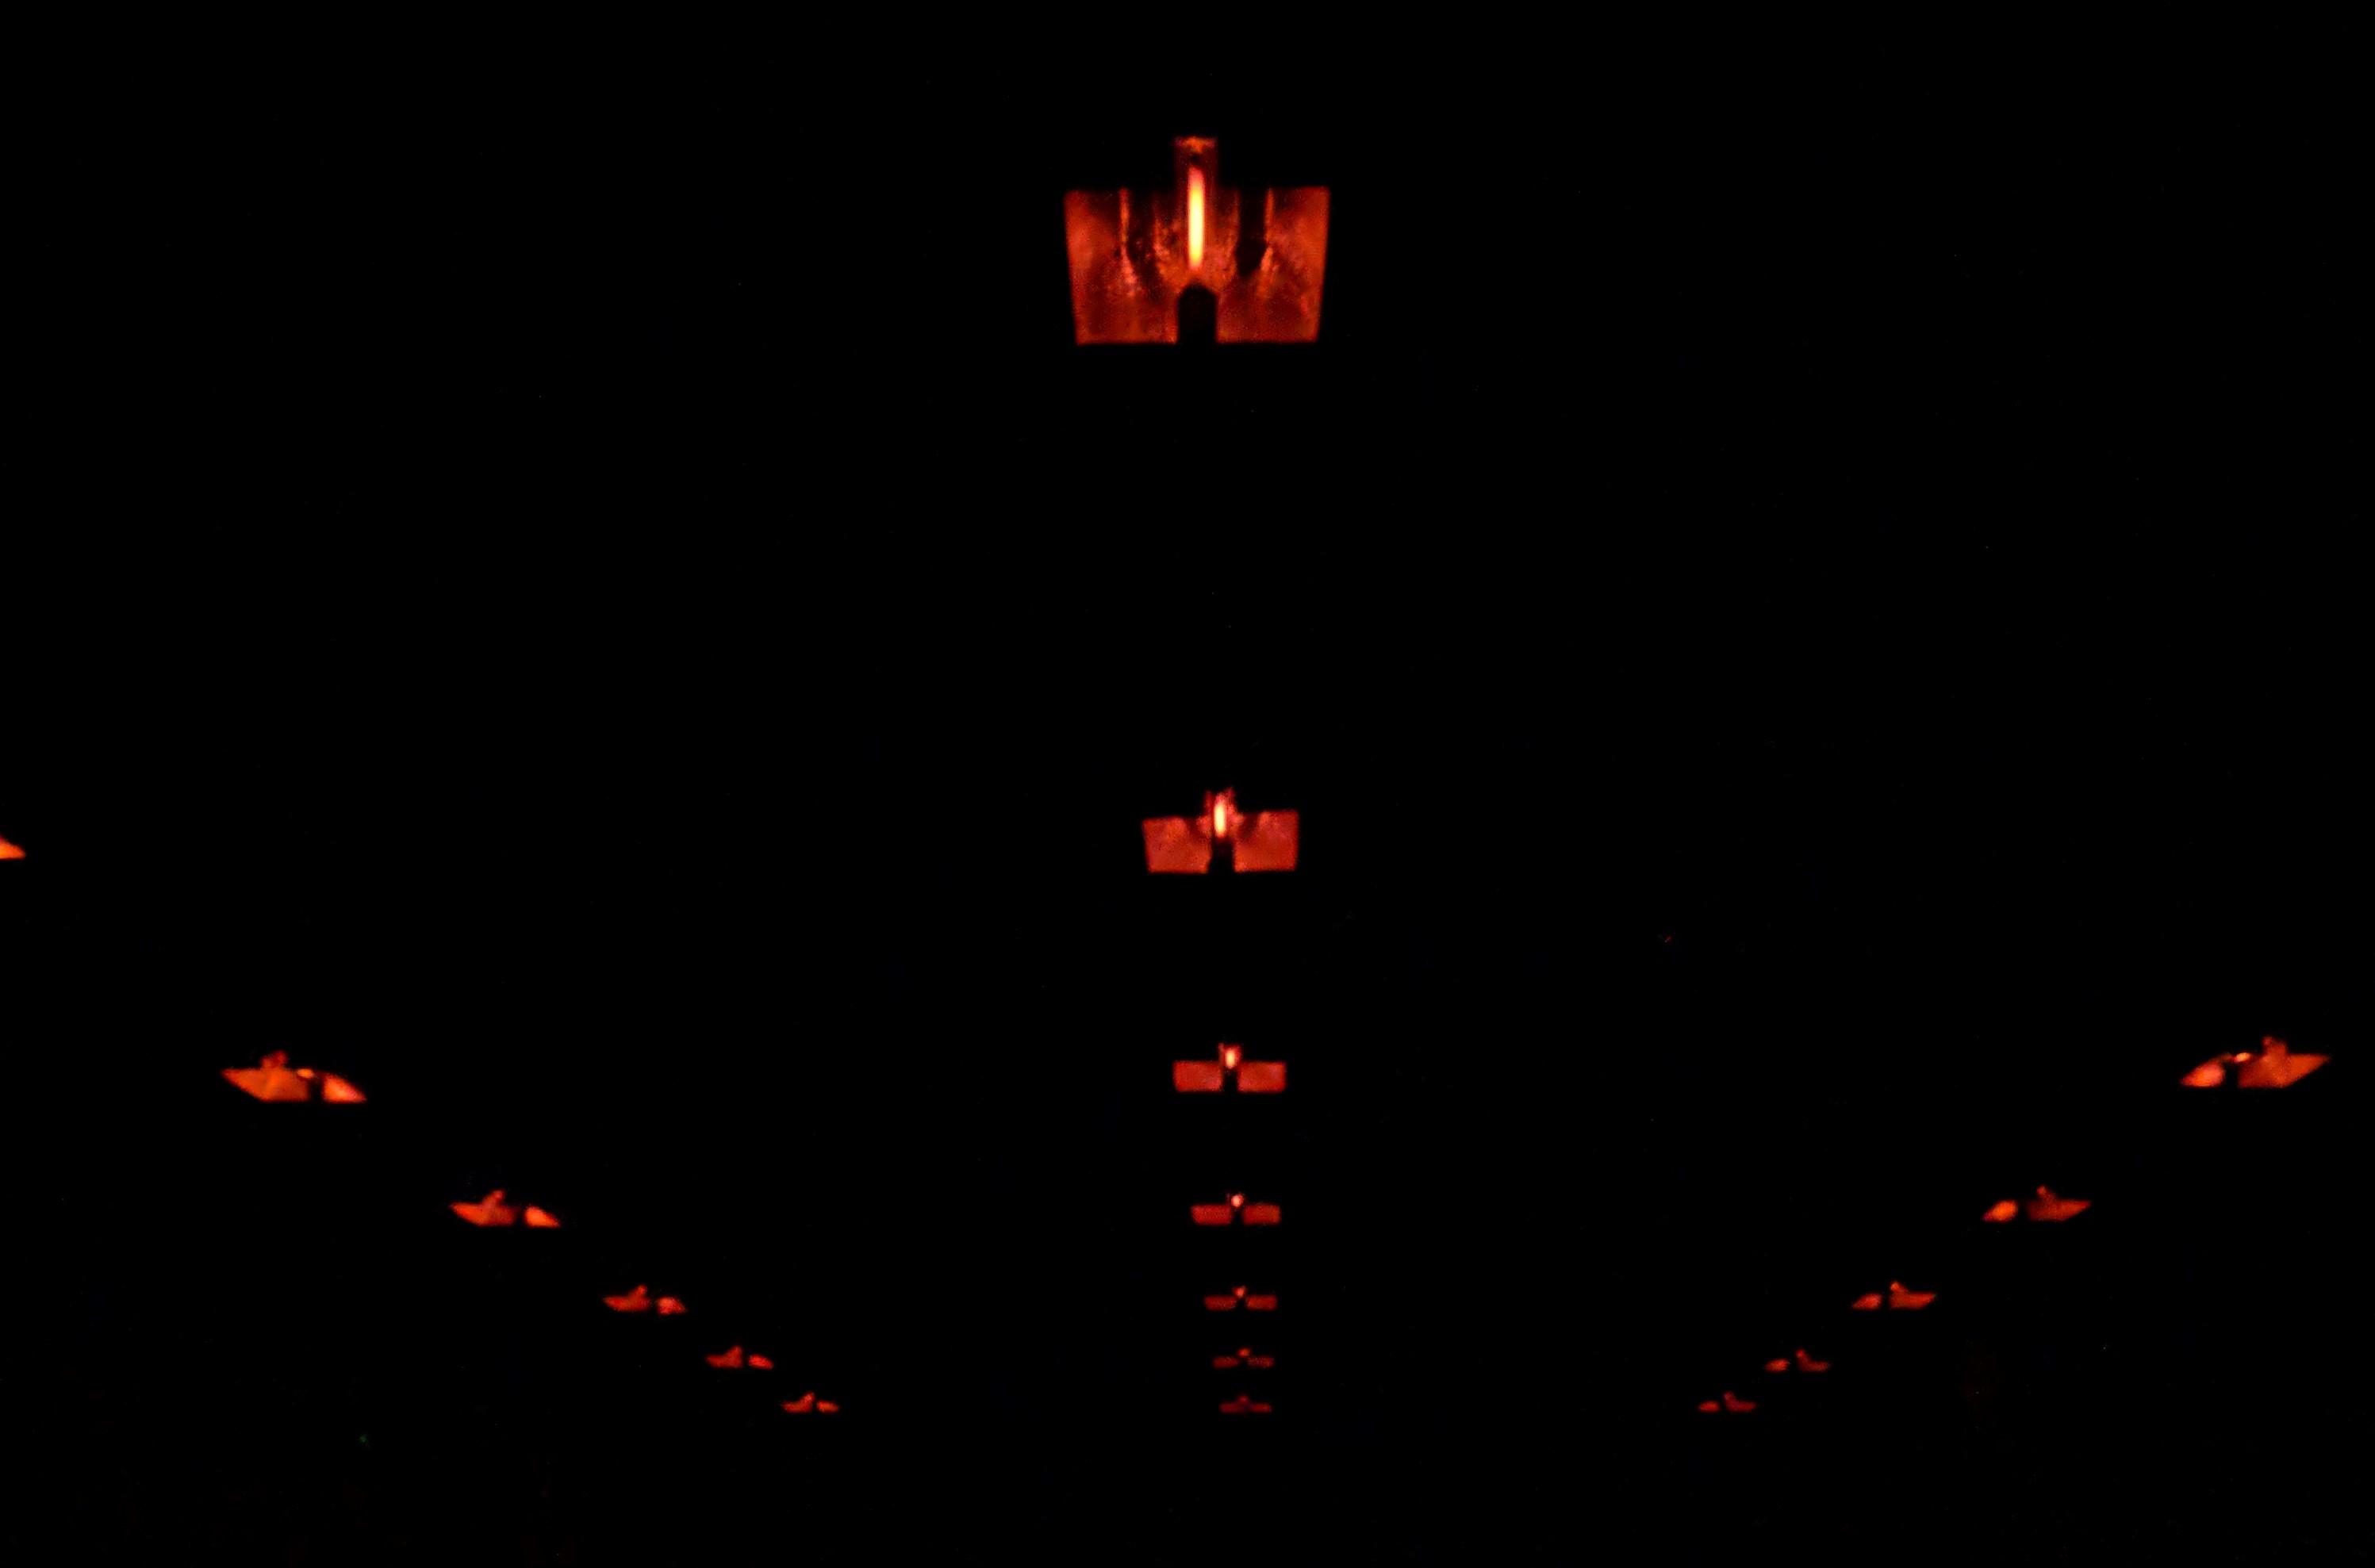 Iluminar lighting dehps 1000w lights